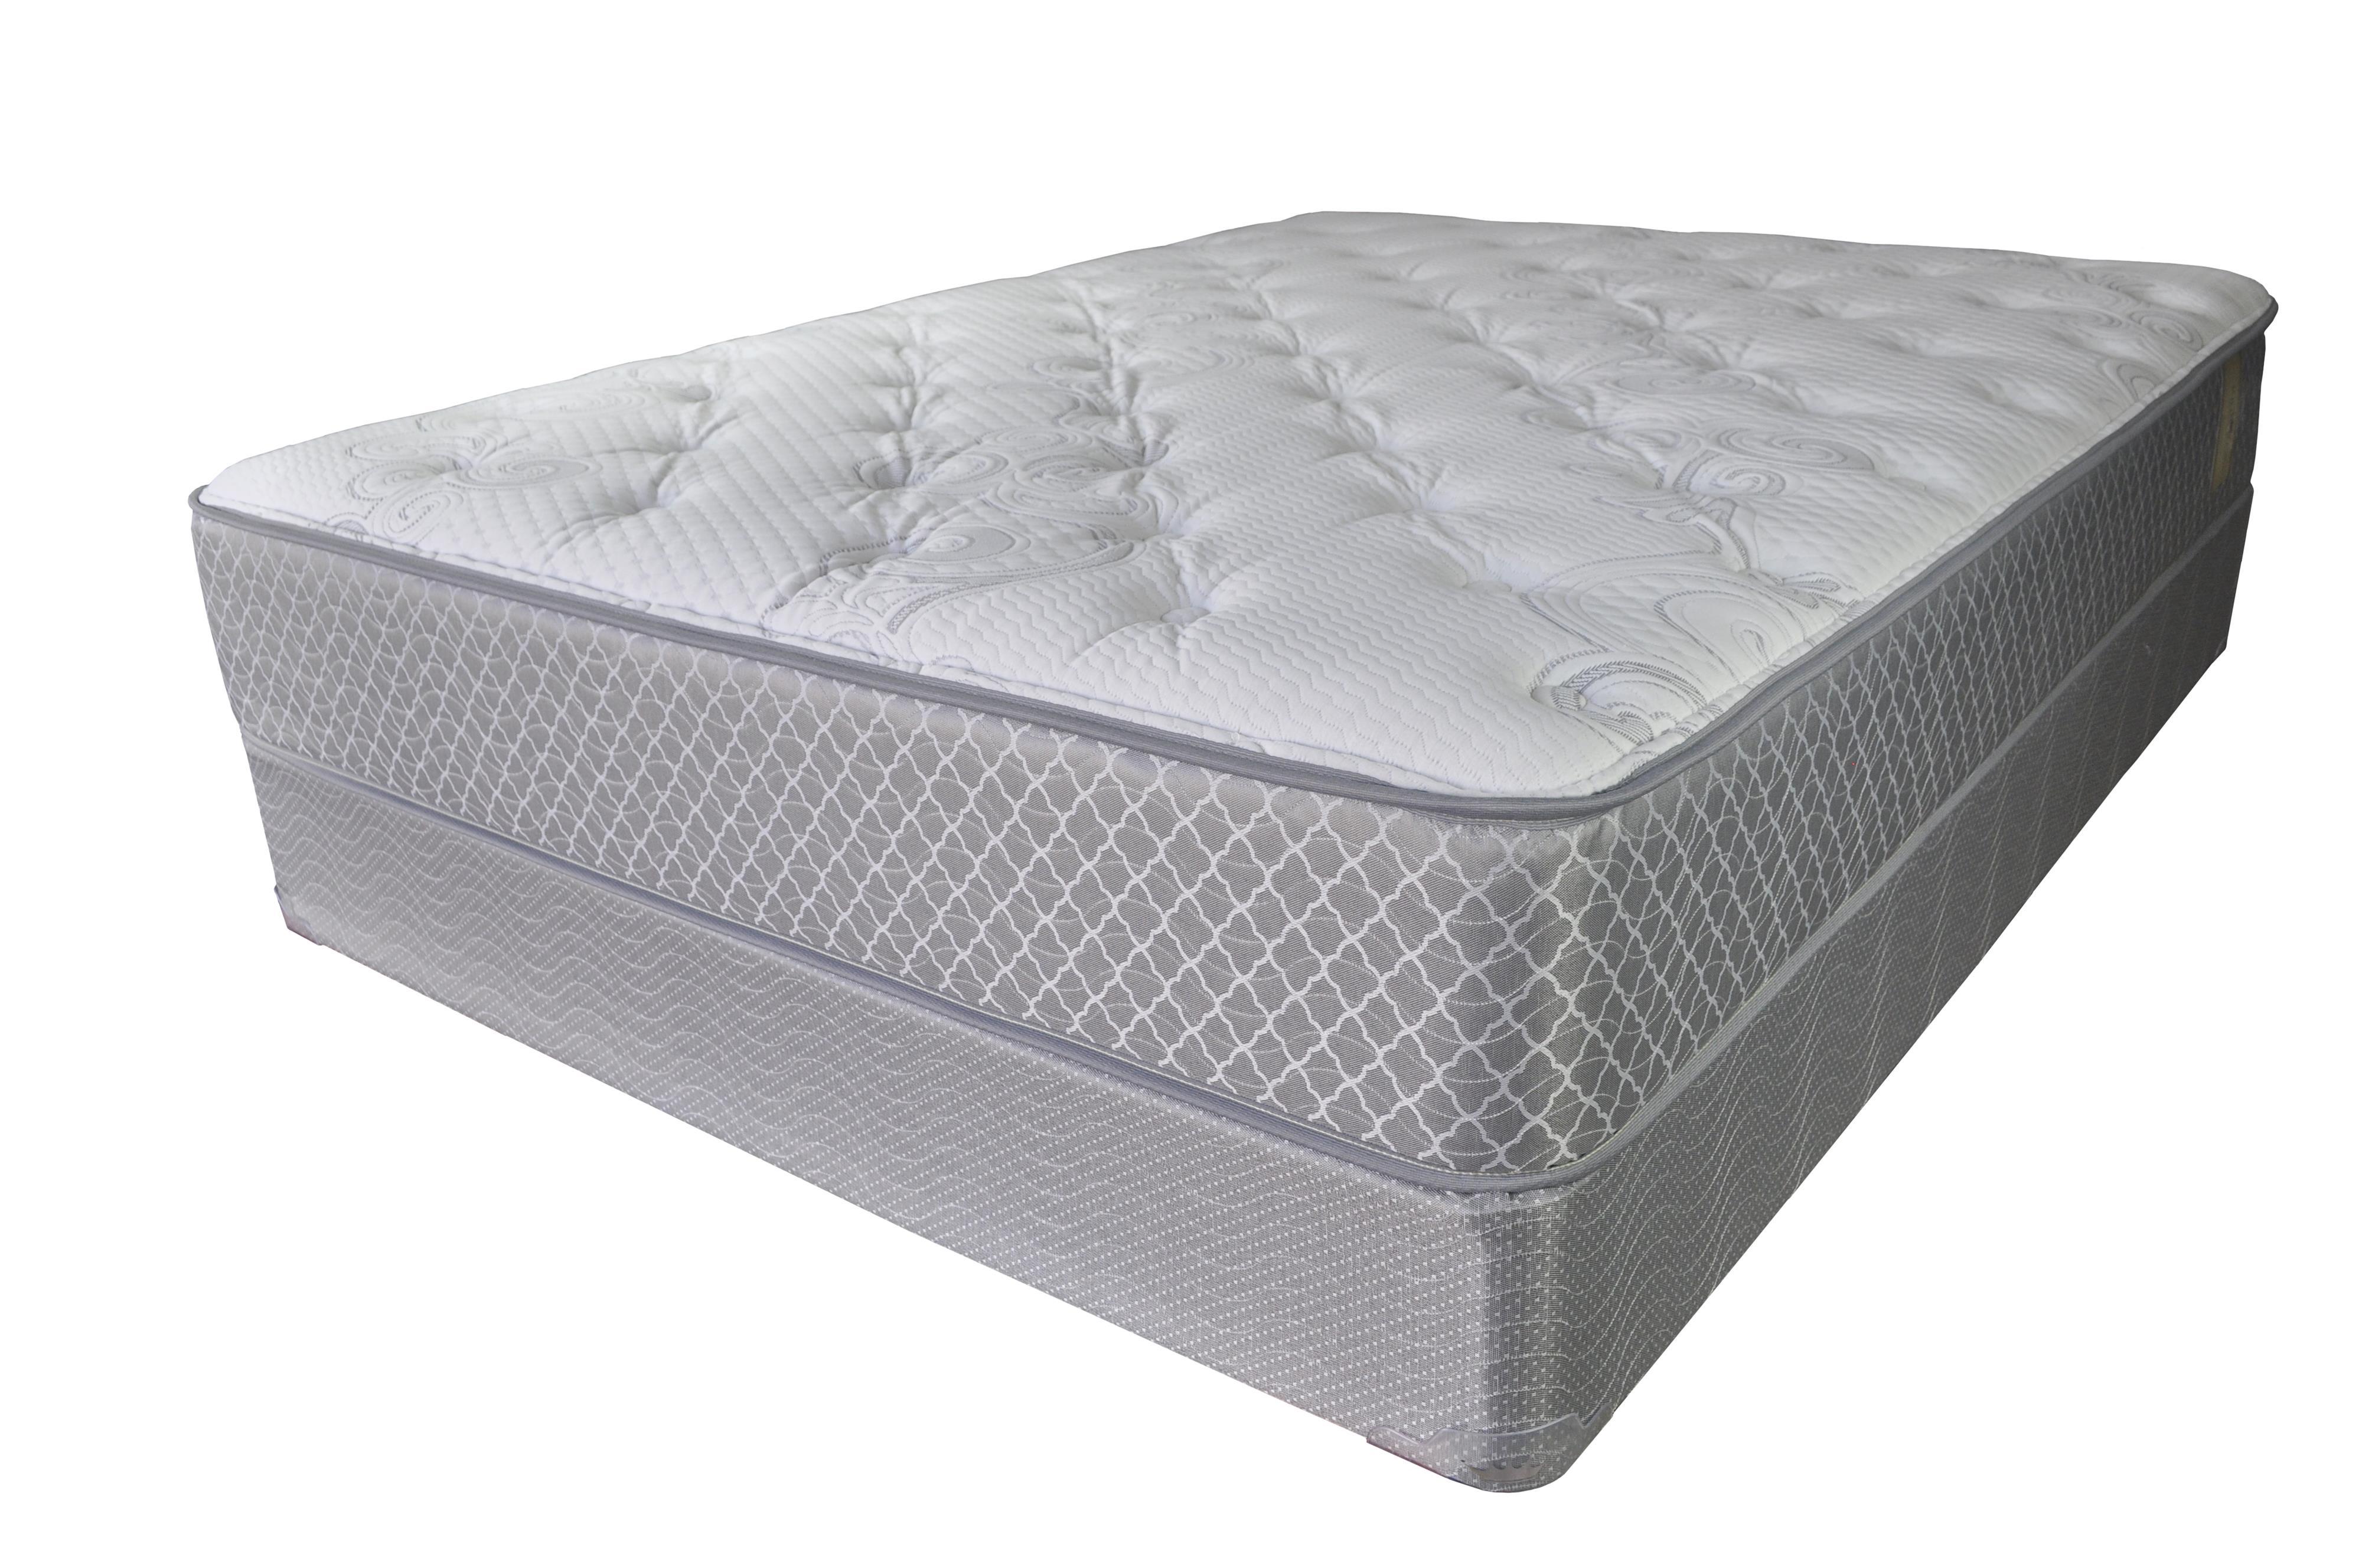 therapedic backsense daytona plush queen plush mattress item number plushq.  therapedic 3inch memory foam mattress topper.